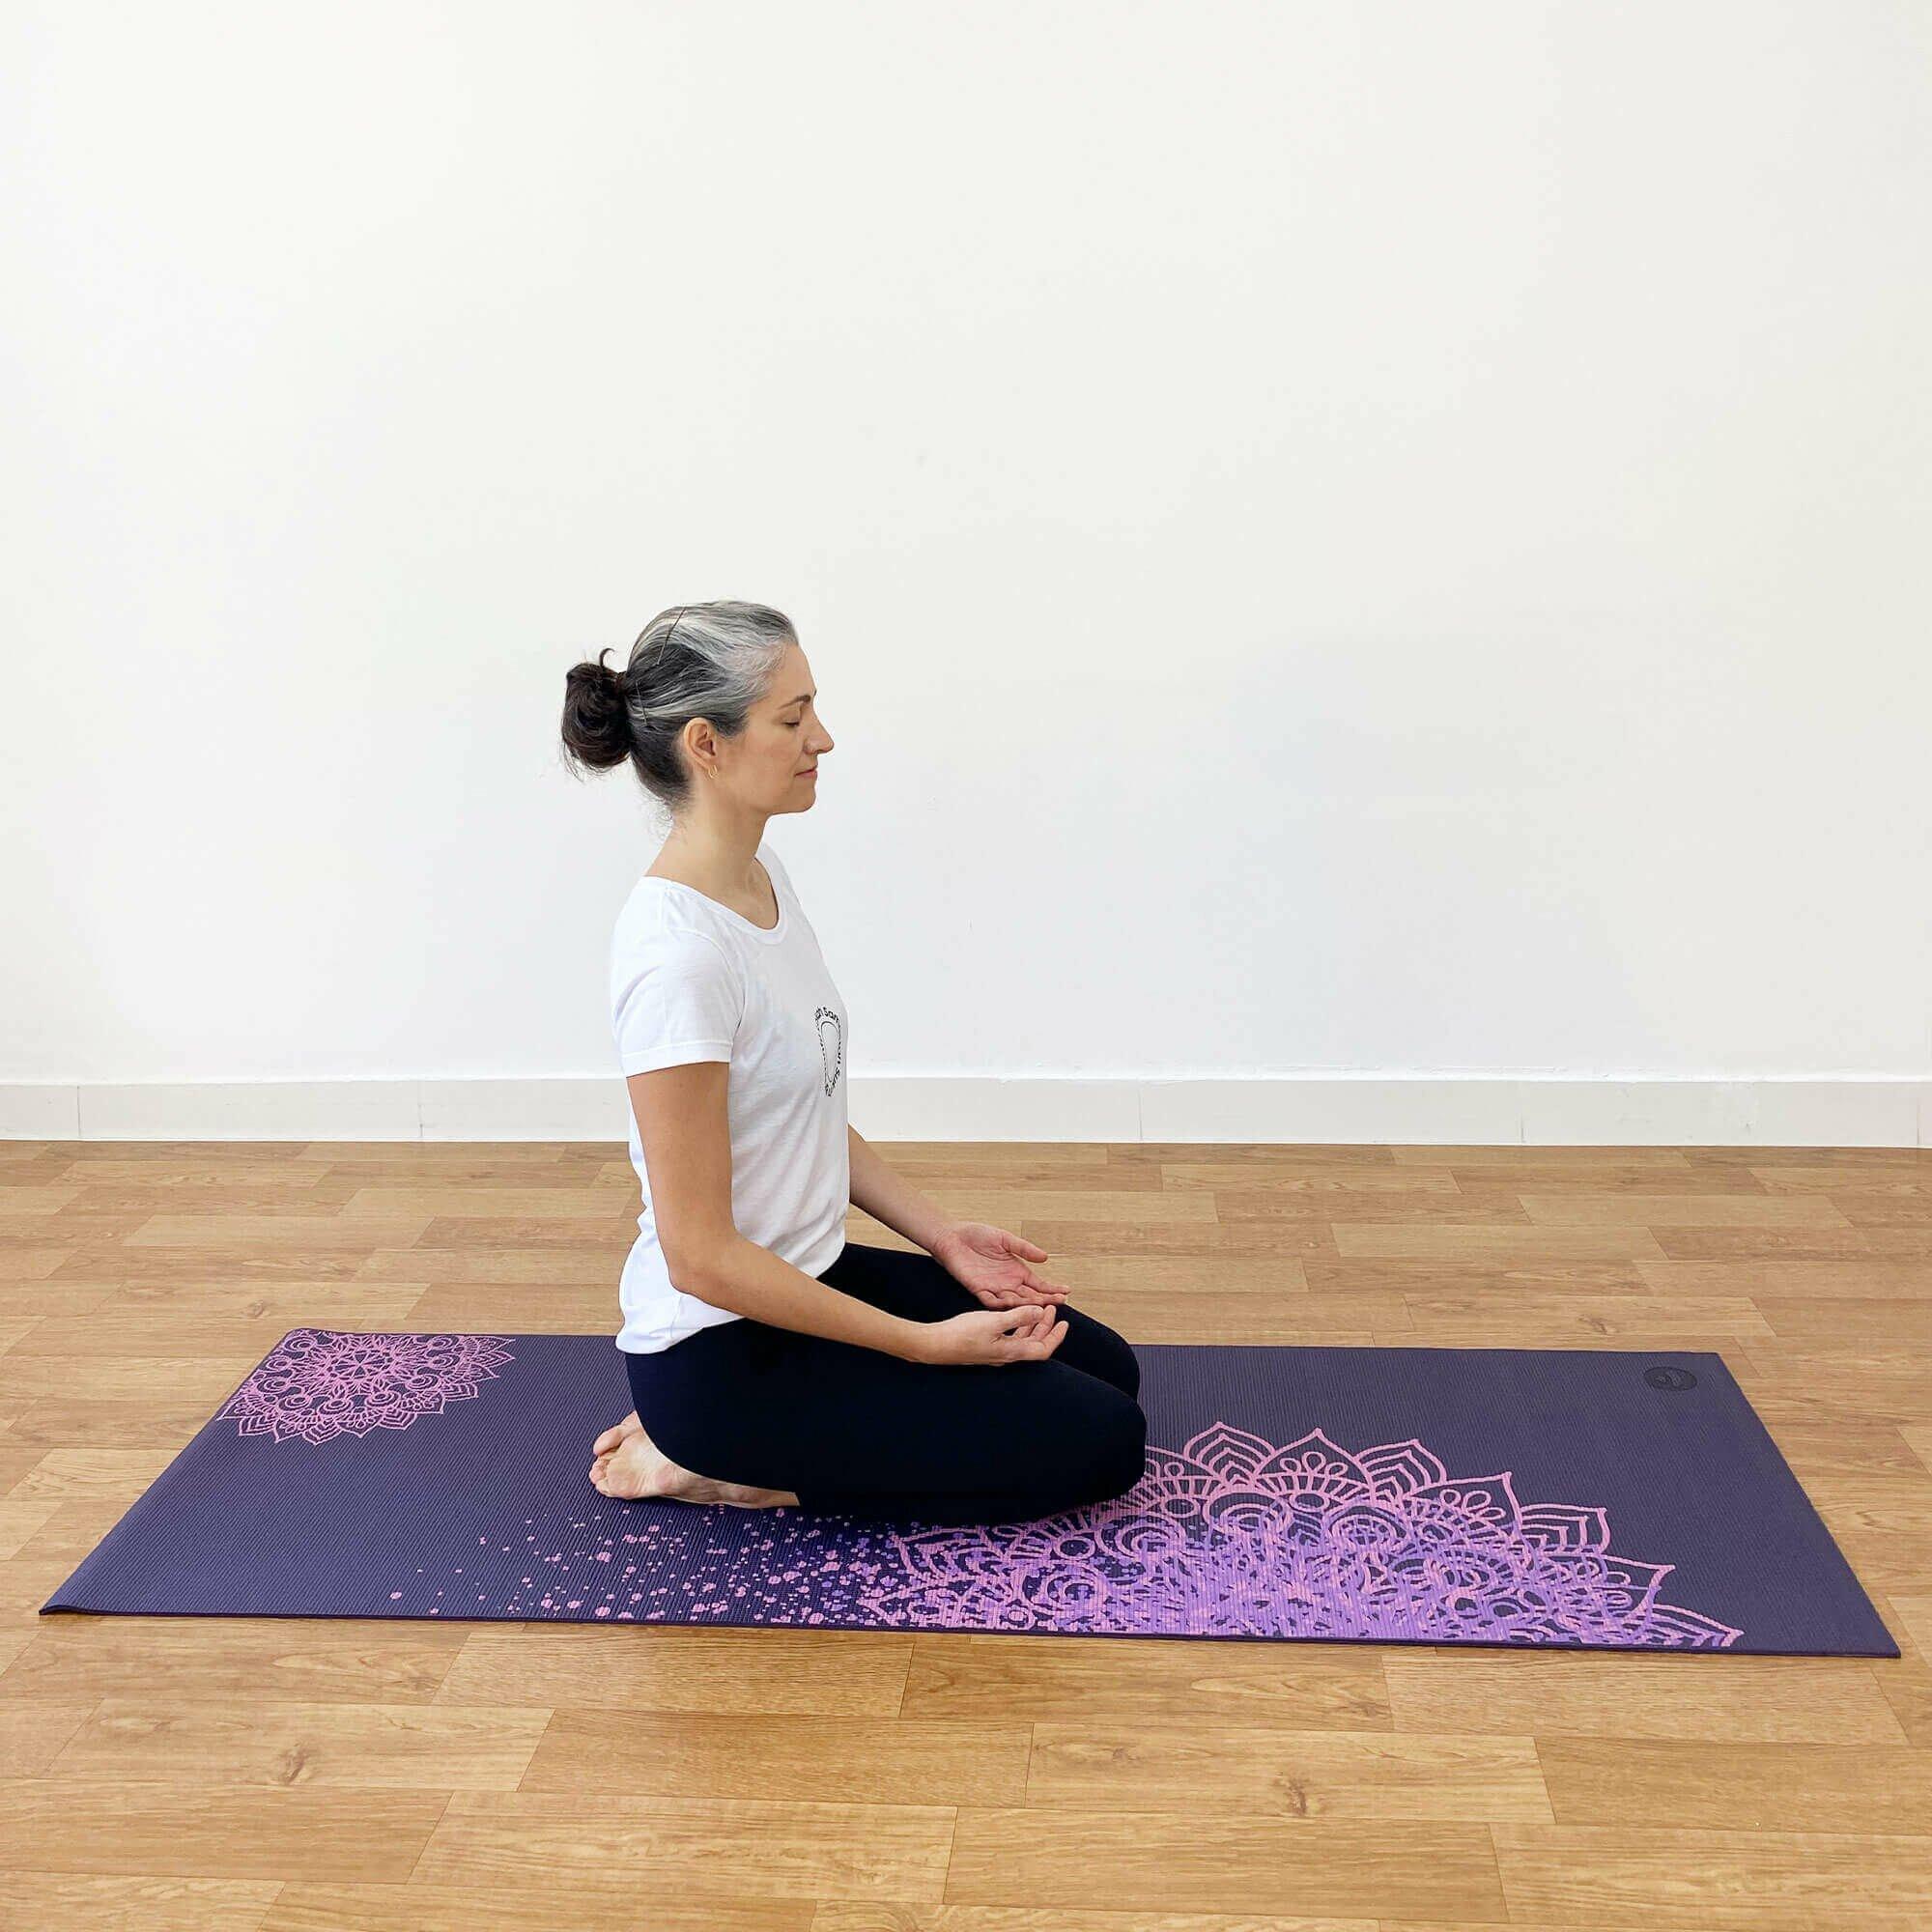 tapete-yoga-leela-mandaladesign-yogateria-ameixa-8